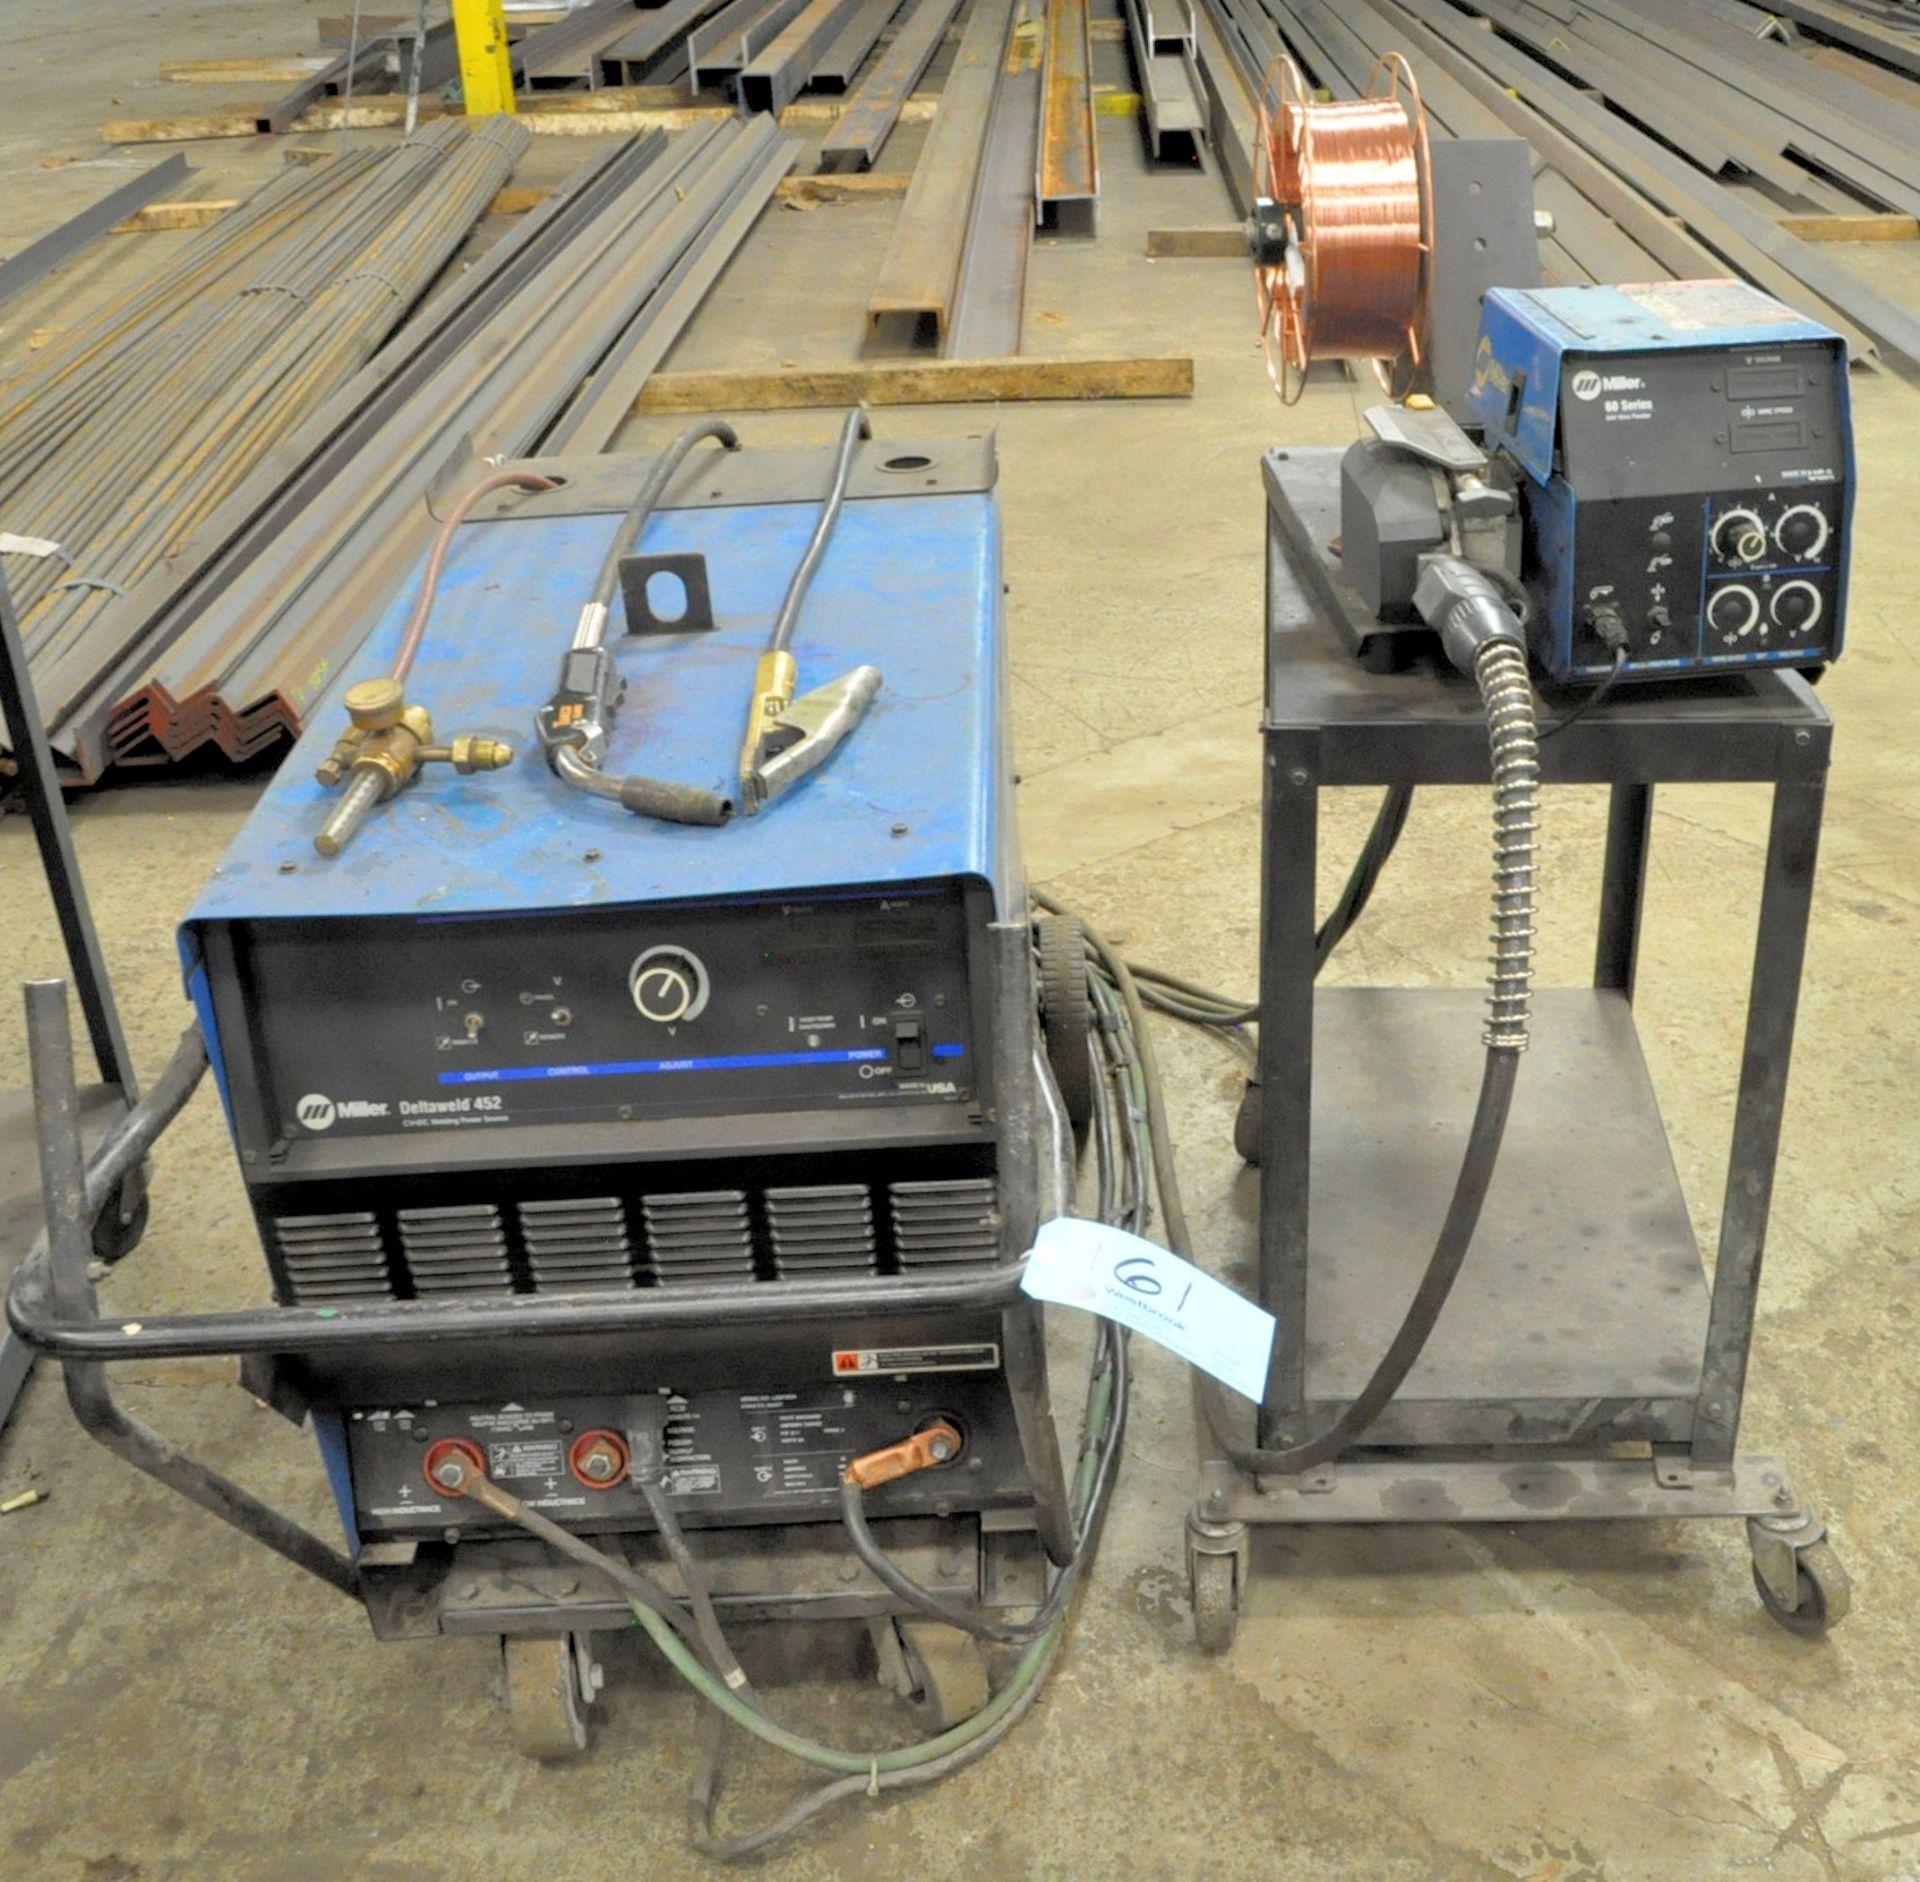 Miller Deltaweld 452, 450-Amp Capacity CV DC Arc Welding Power Source with Miller 60 Wire Feeder